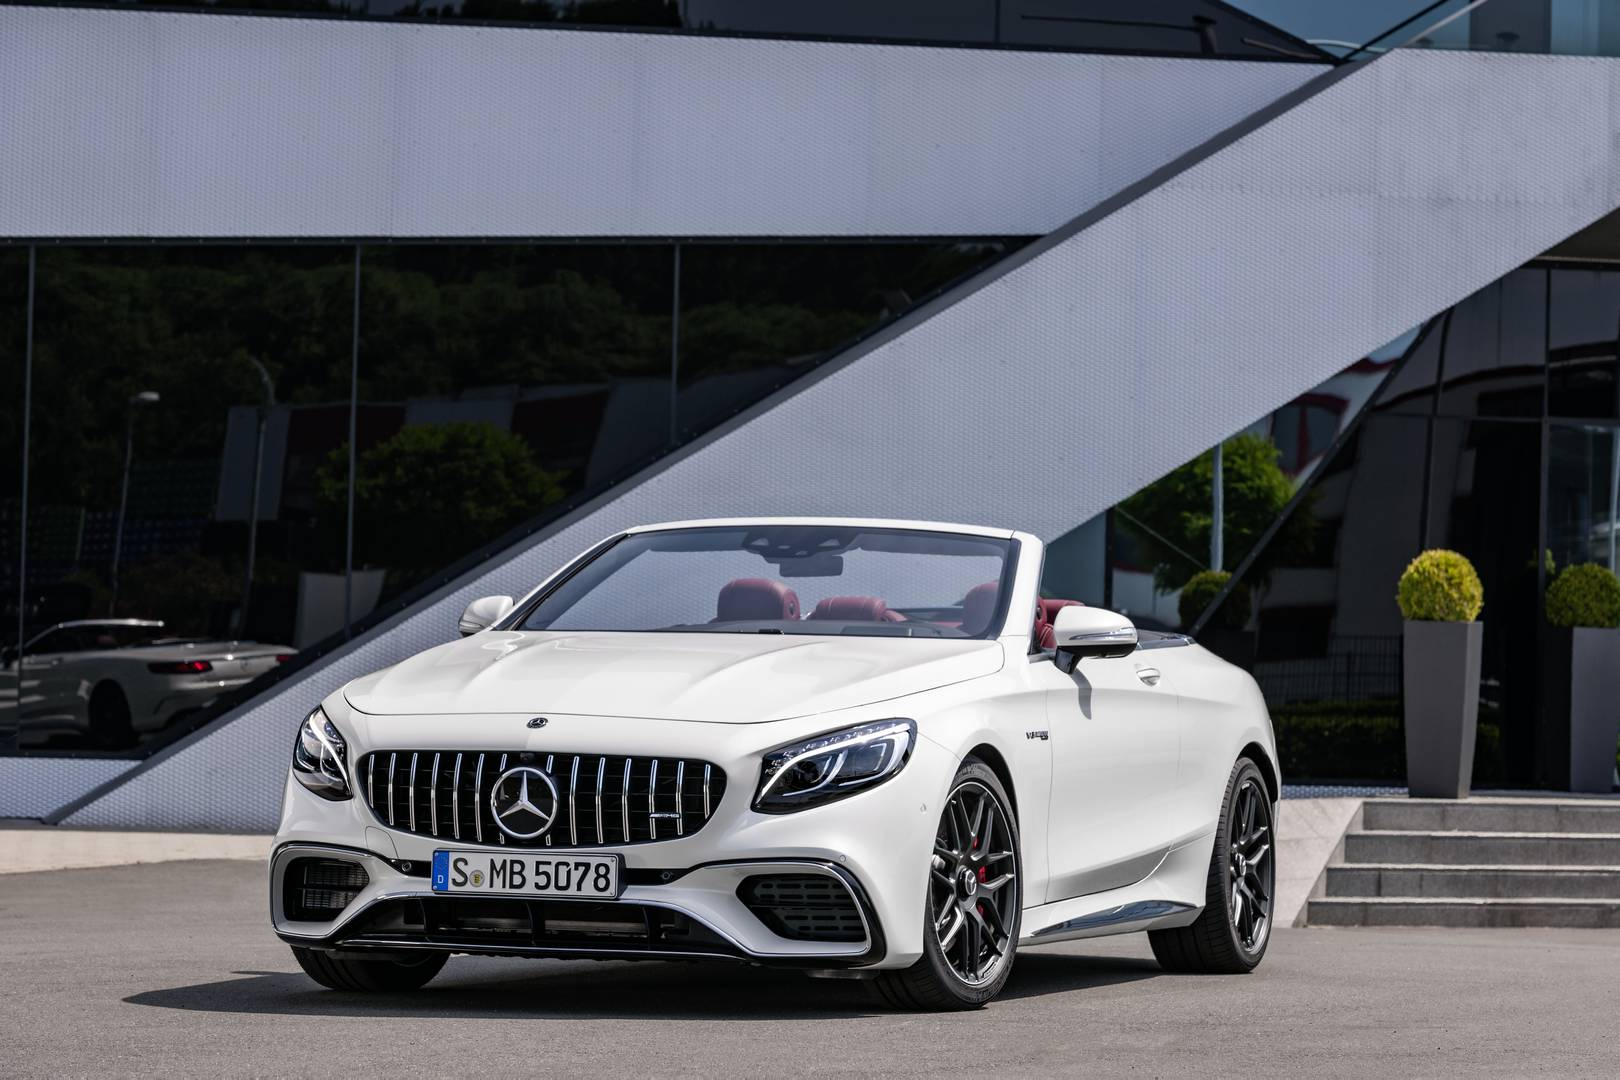 https://www.tuning-empire.com/wordpress/wp-content/uploads/Mercedes-AMG-S63-Cabriolet-4.jpg